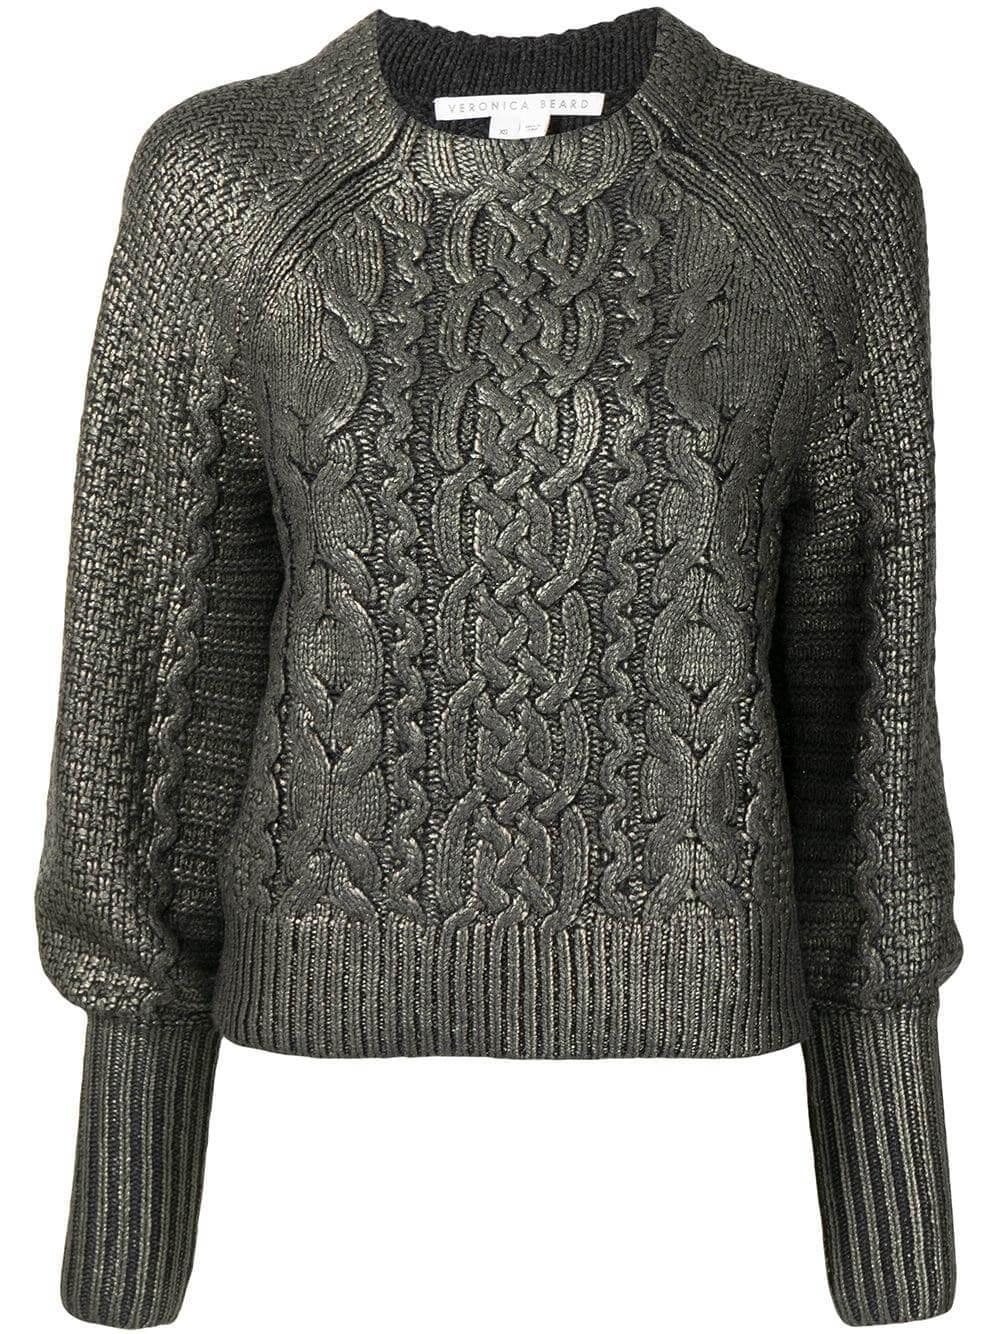 Yola Foiled Sweater